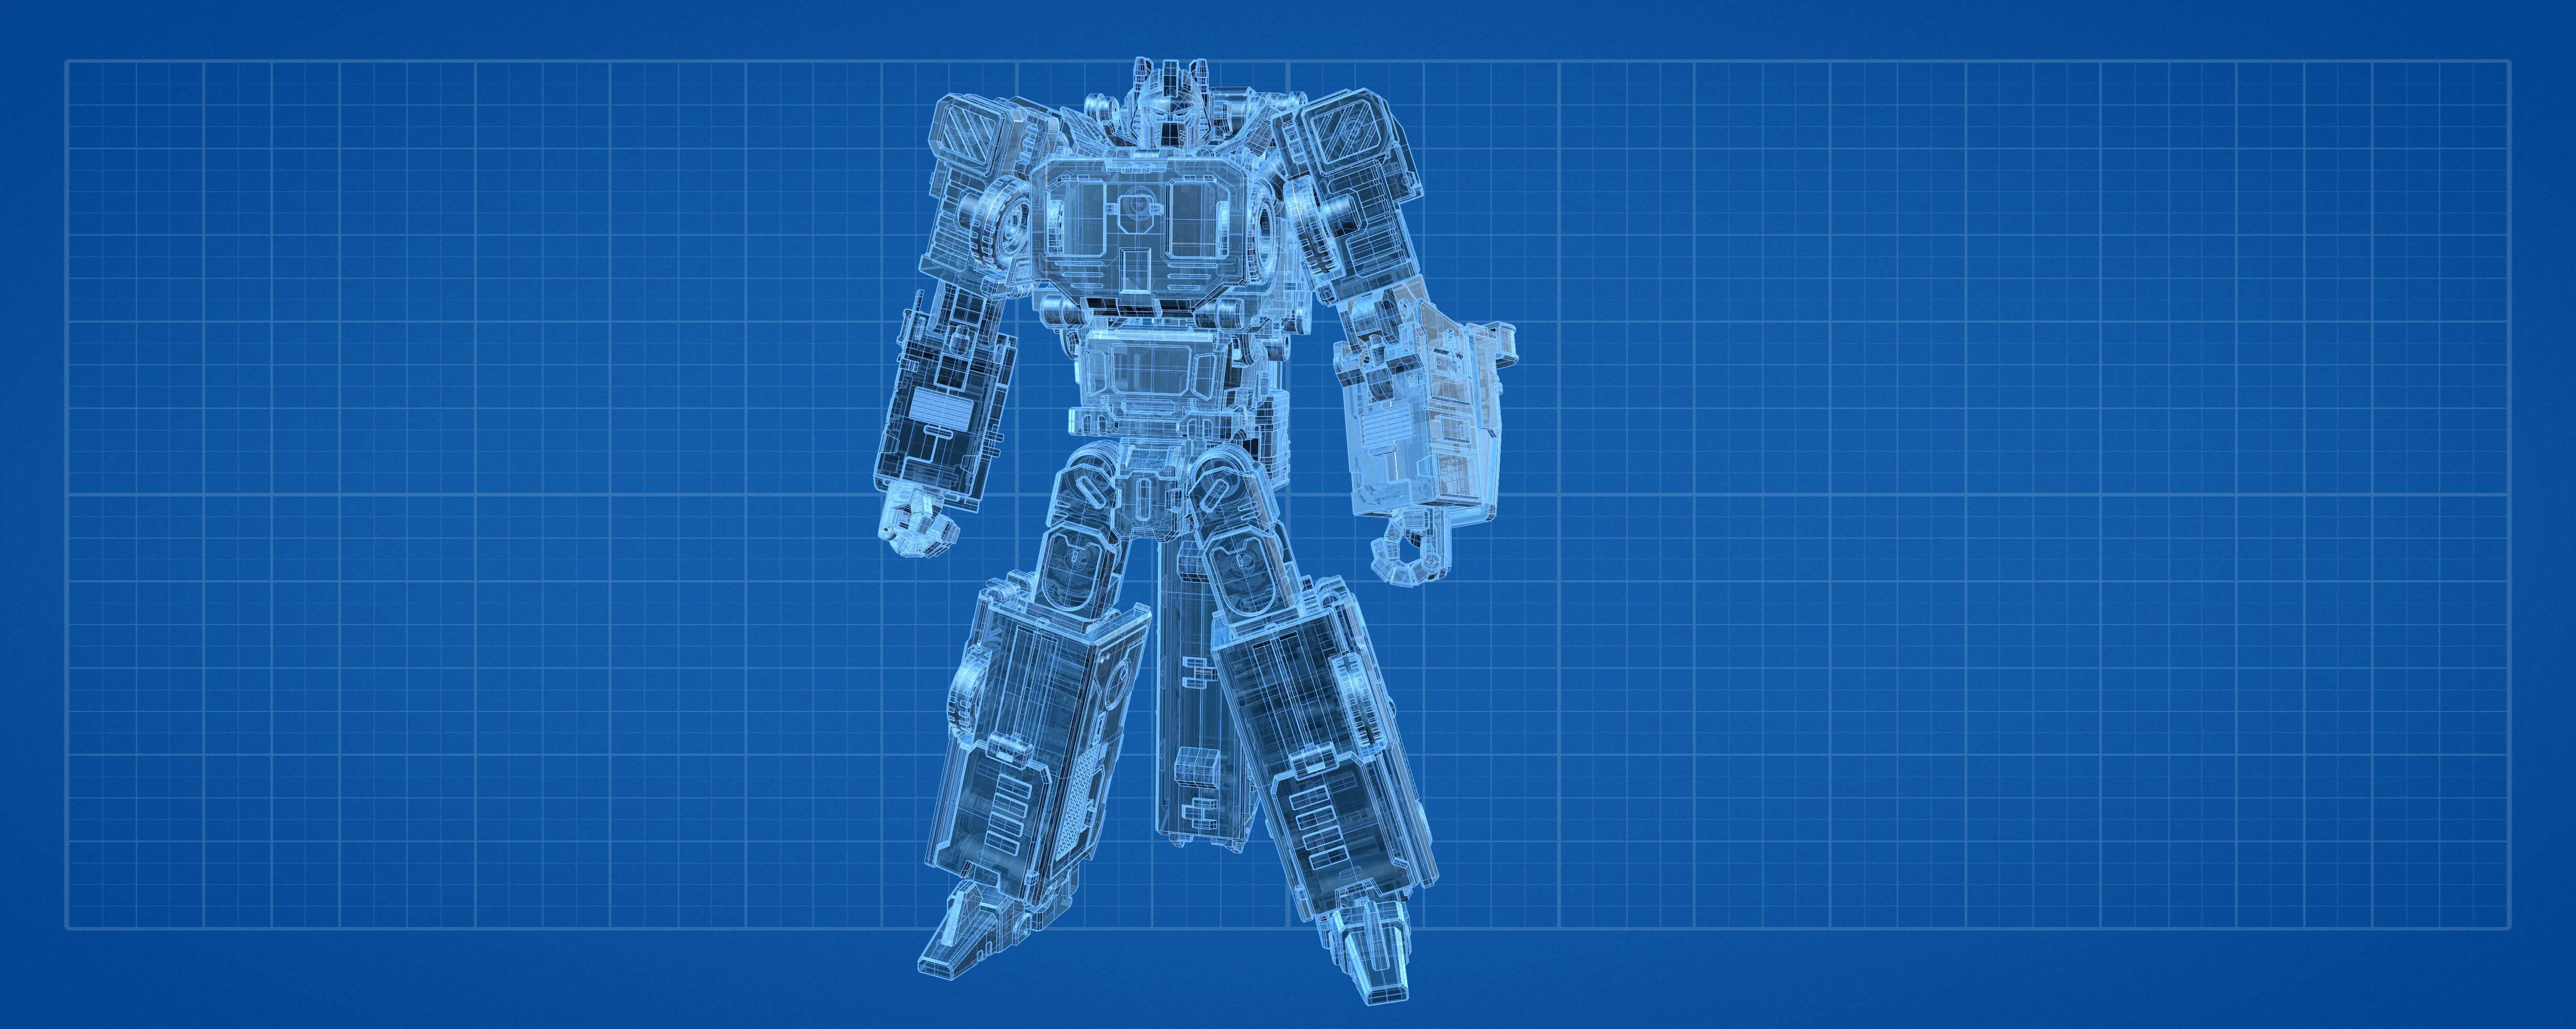 [Ocular Max] Produit Tiers - Maximus Pro (PS-21 à PS-25) - aka Defensor/Défenso ME7CVTWB